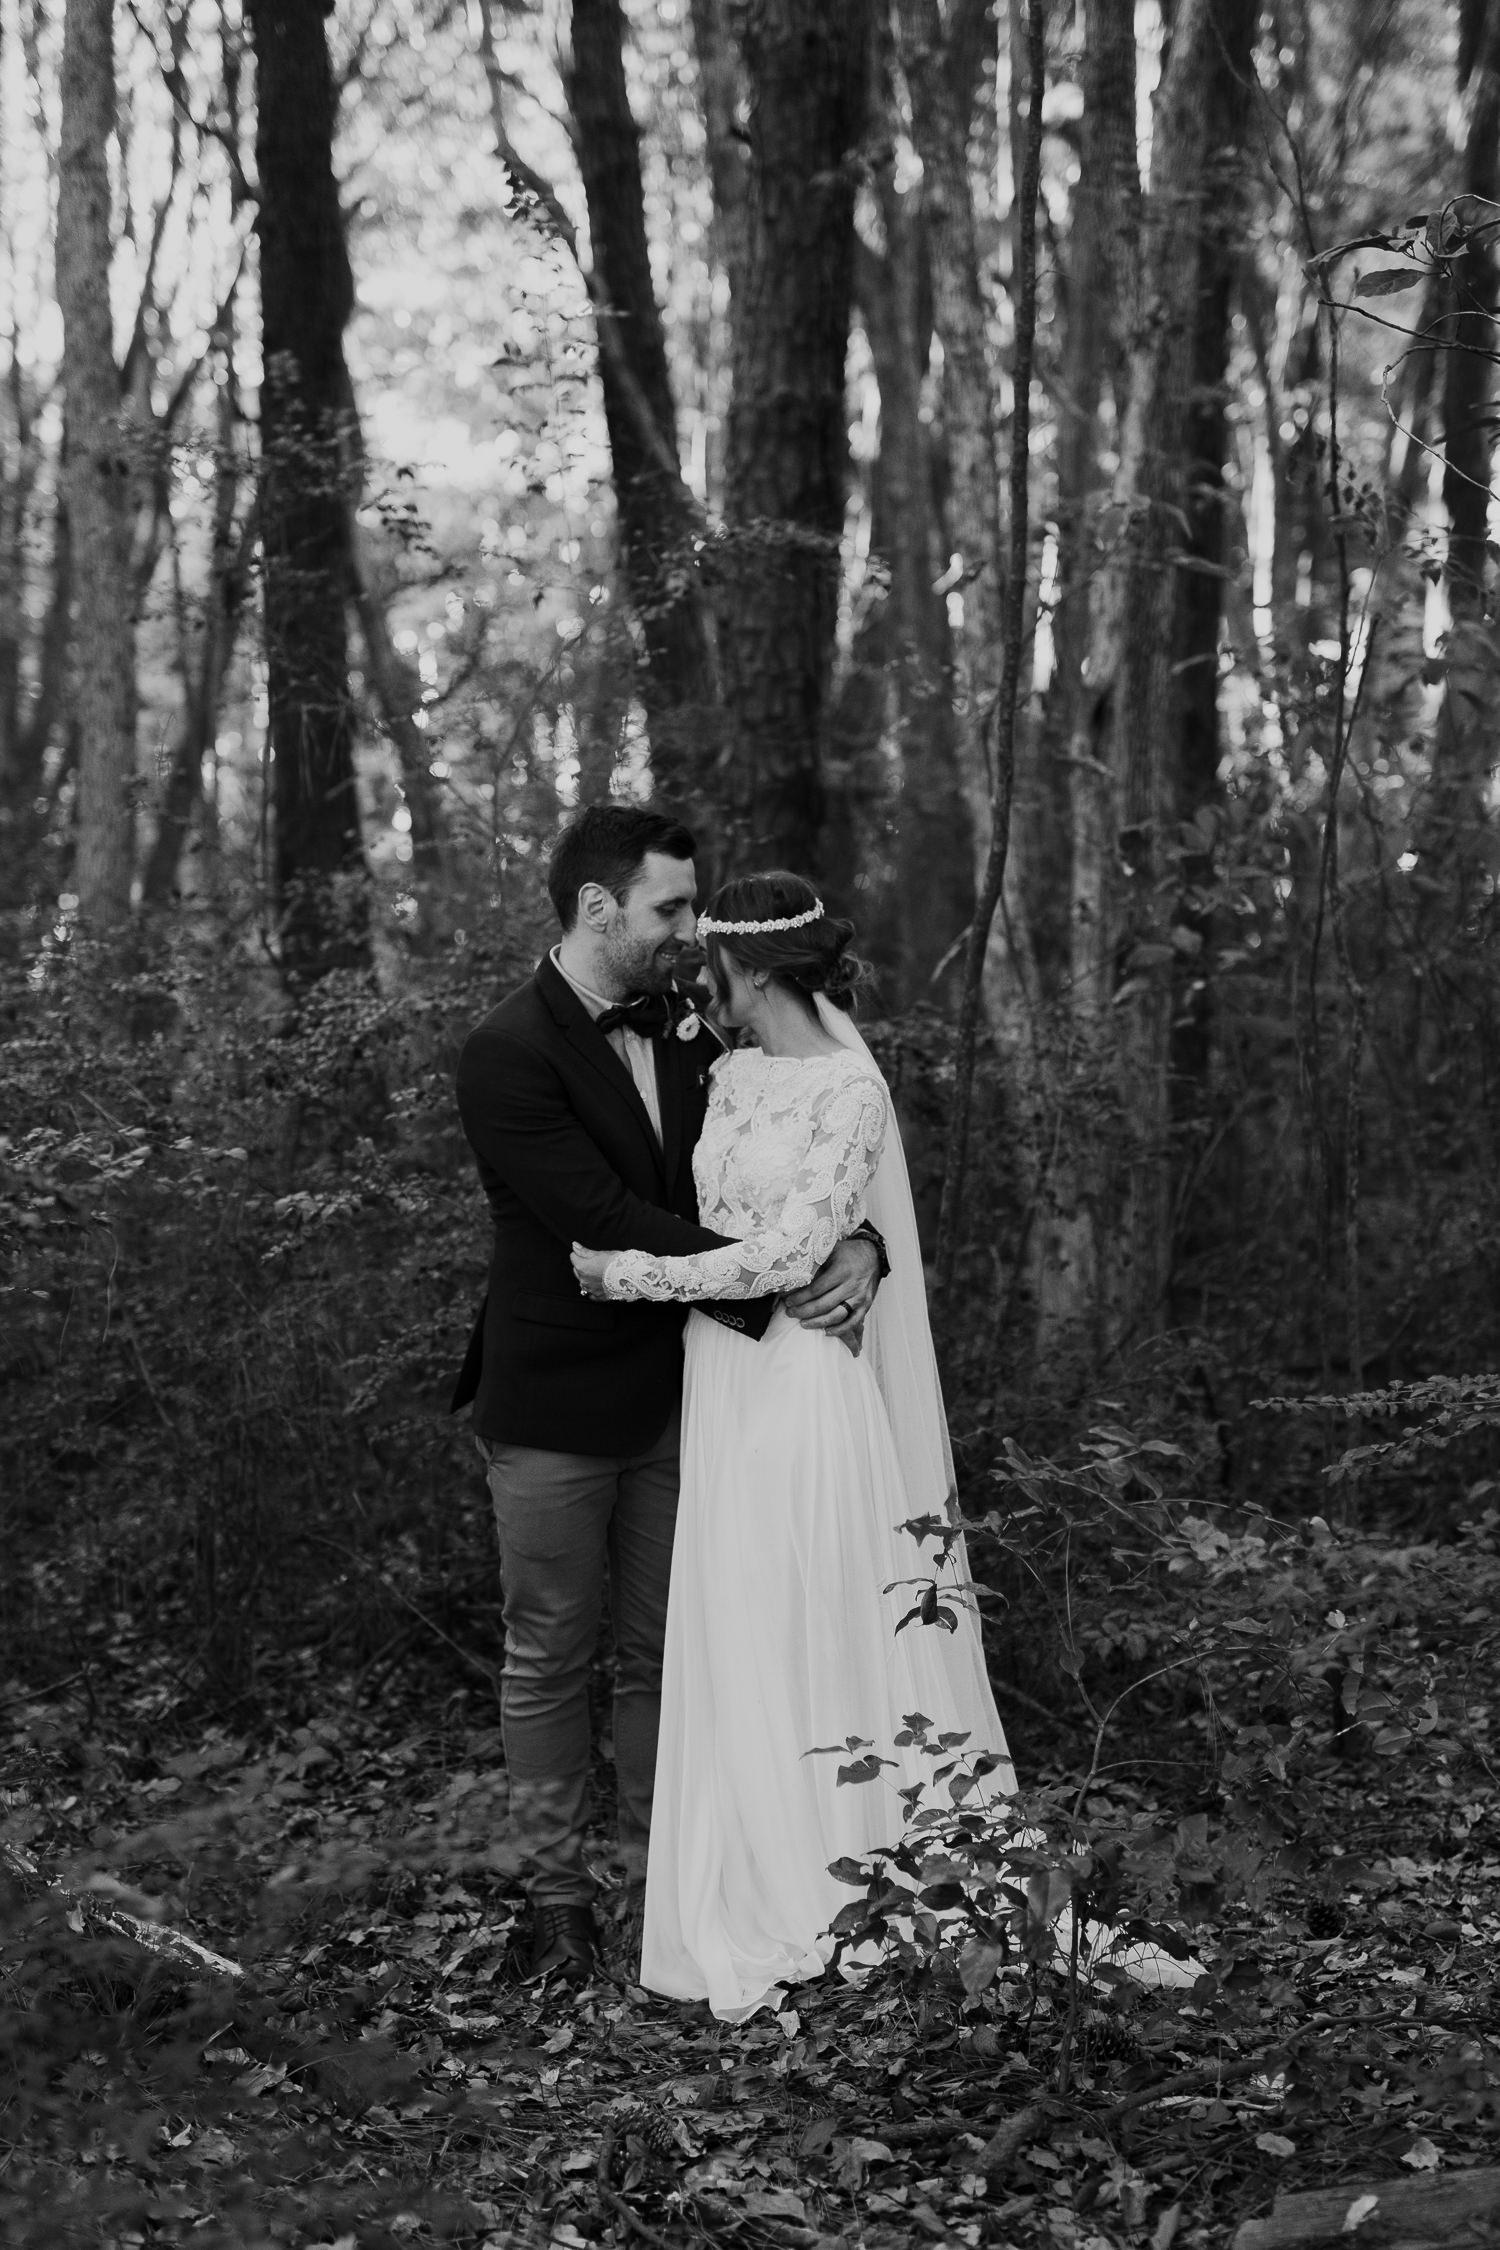 byron_bay_wedding_photographer064.jpg